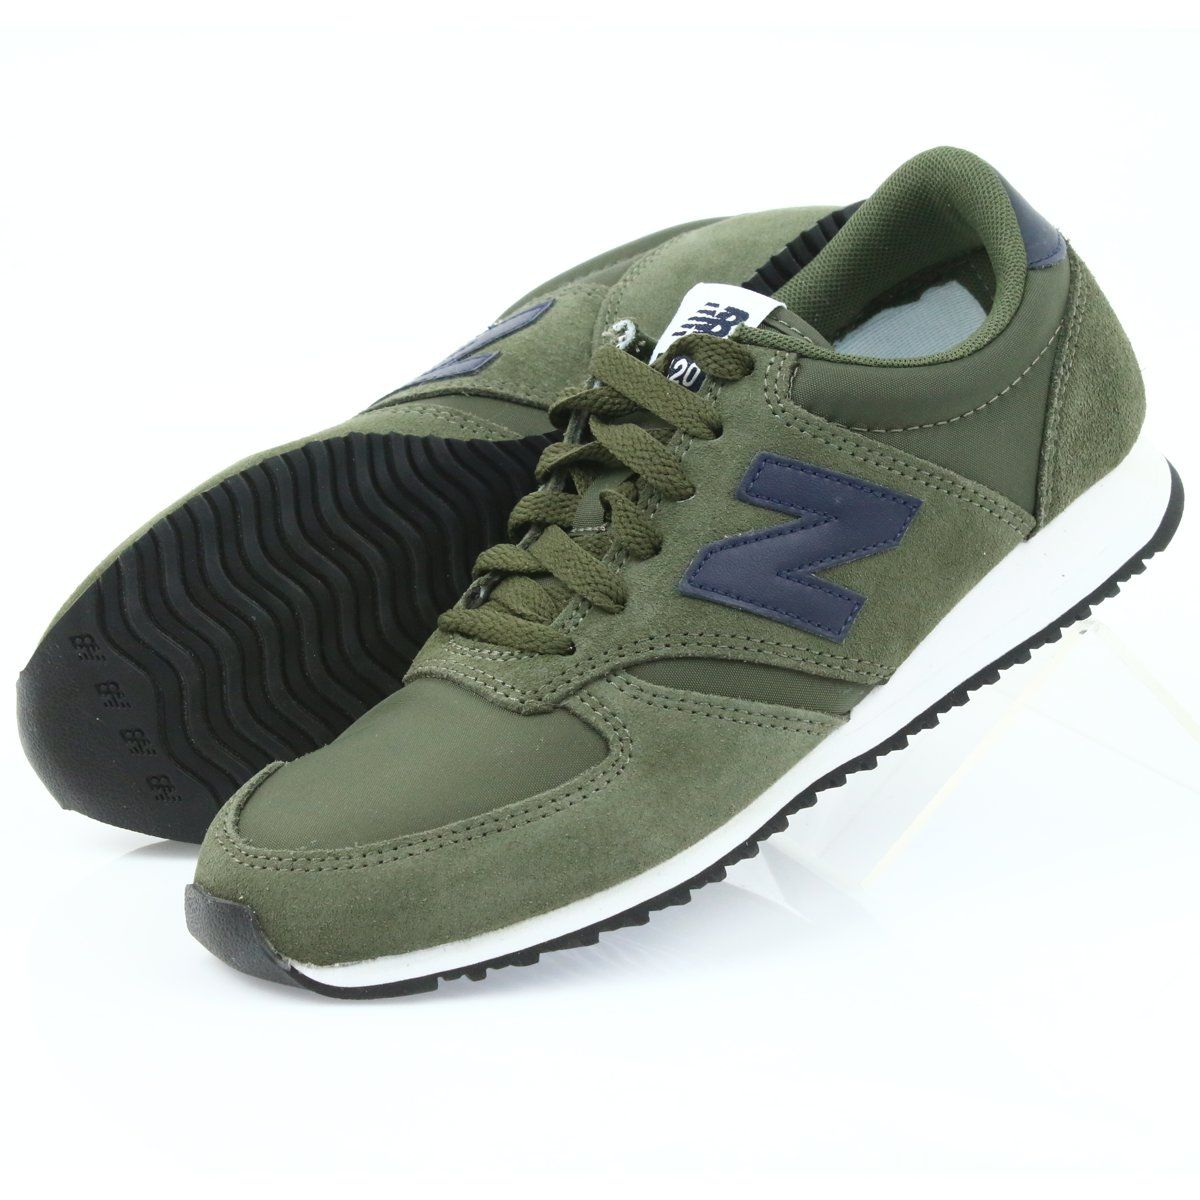 New Balance U420jde Covert Green Pigment Jade Zielone Granatowe Stylish Sneakers Sport Shoes Women New Balance